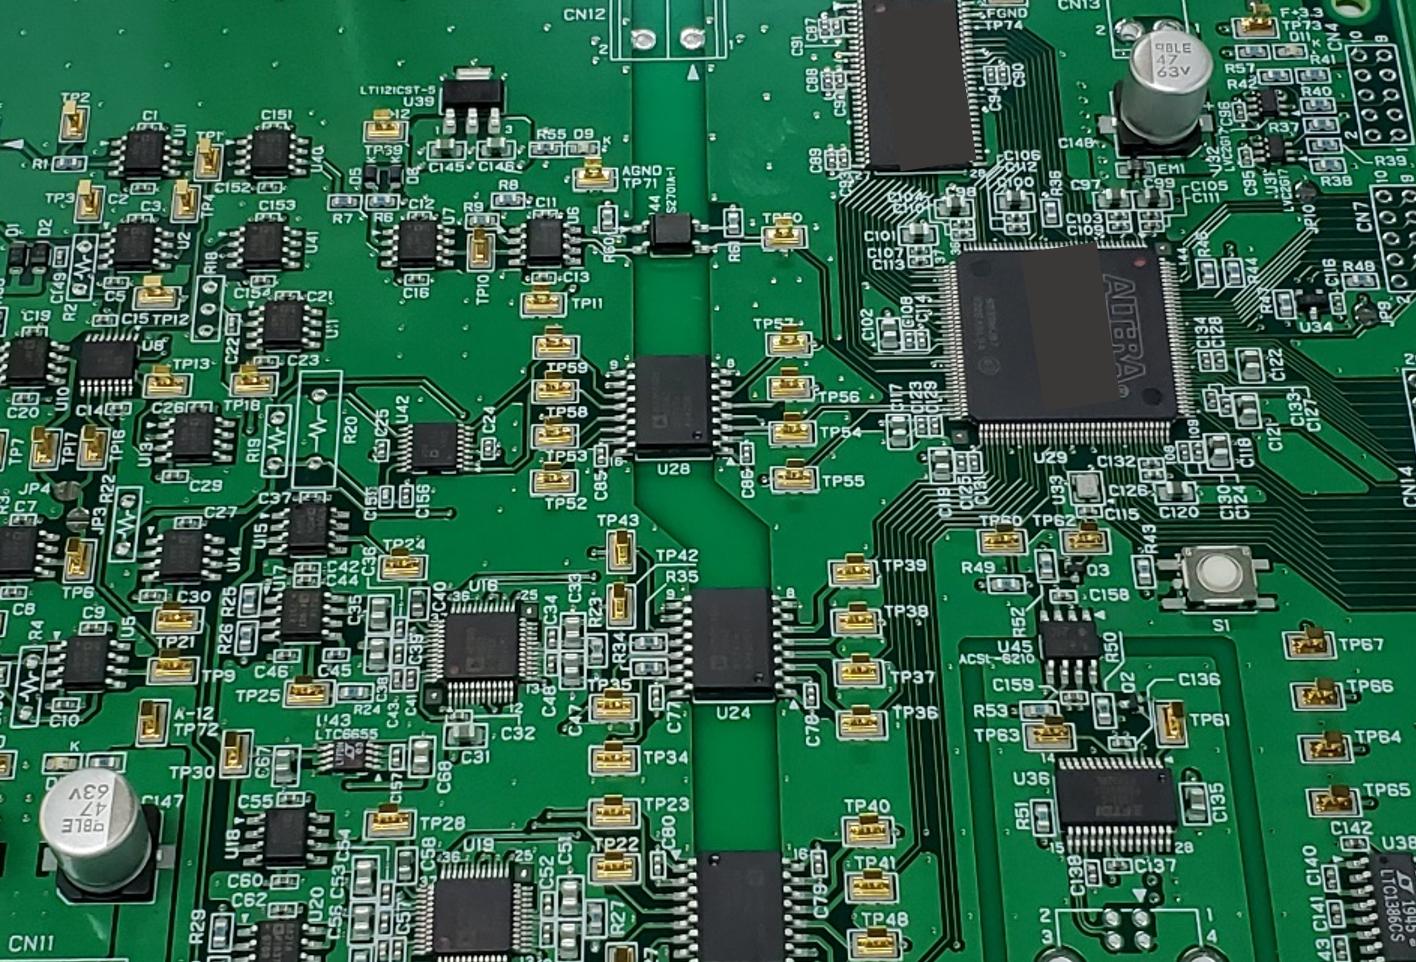 FPGAコントローラ基板(シュミットトリガ)